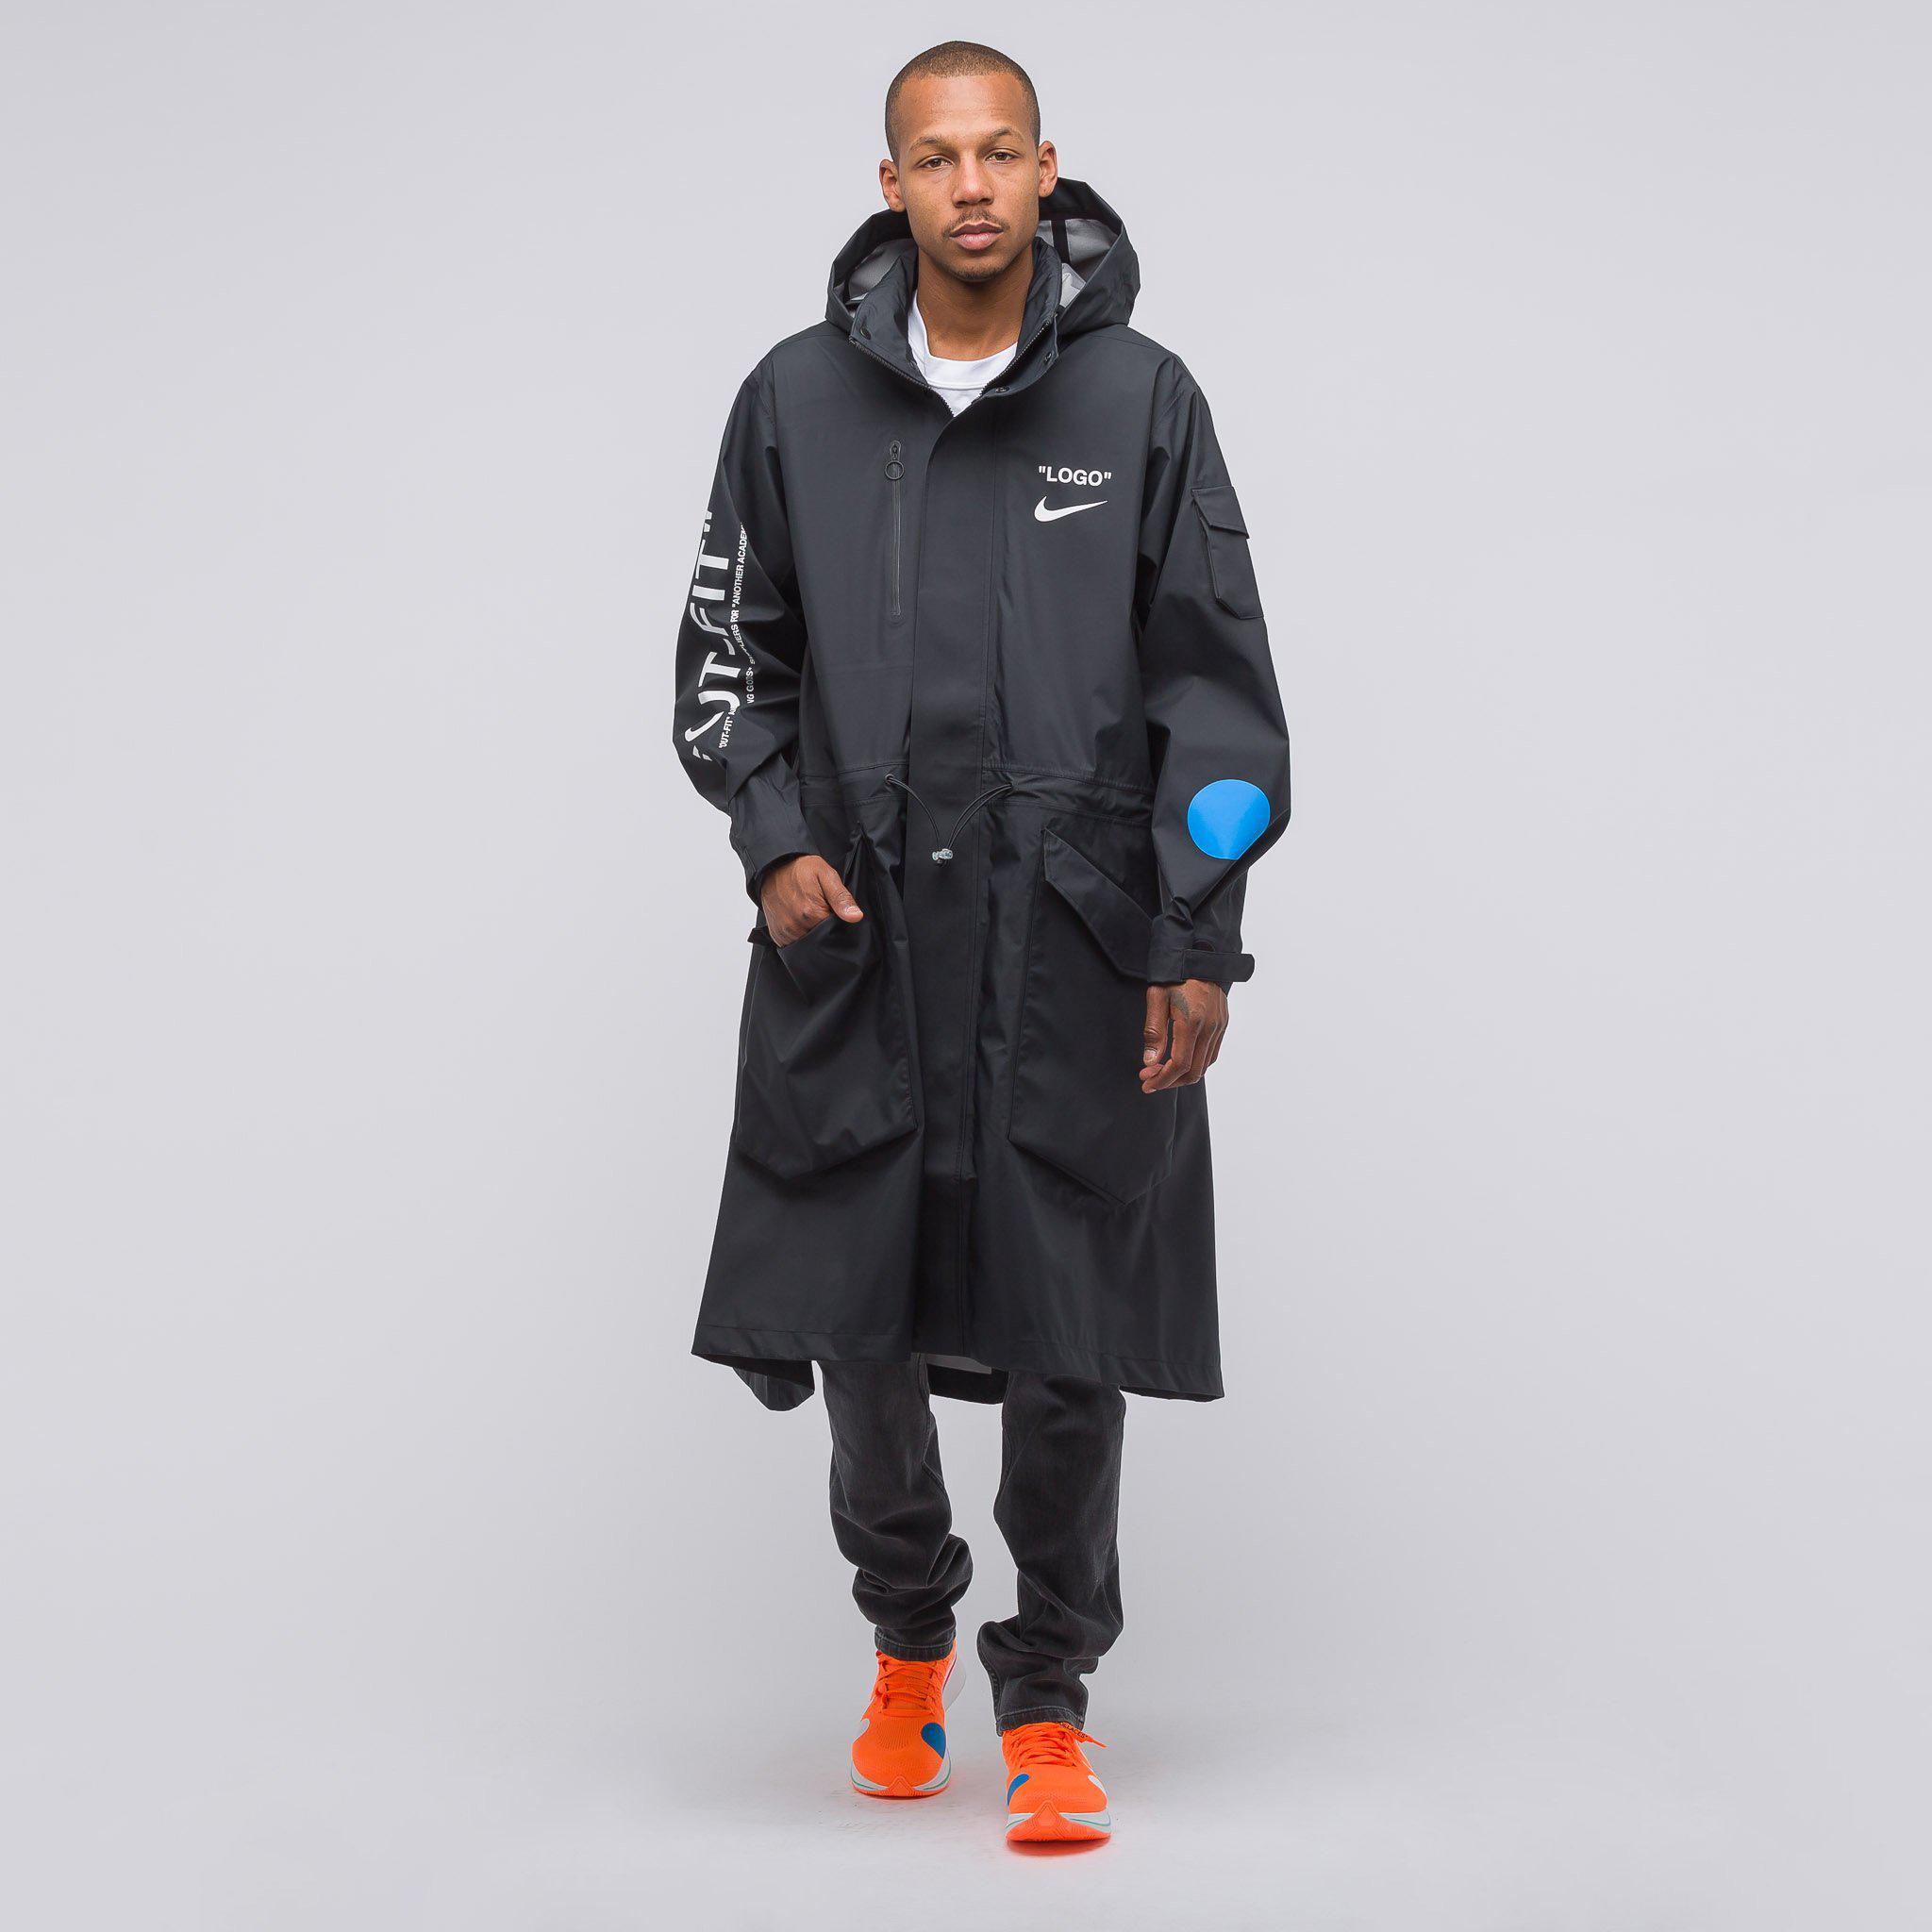 1365f002eb Nike X Off-white Jacket In Black in Black for Men - Lyst